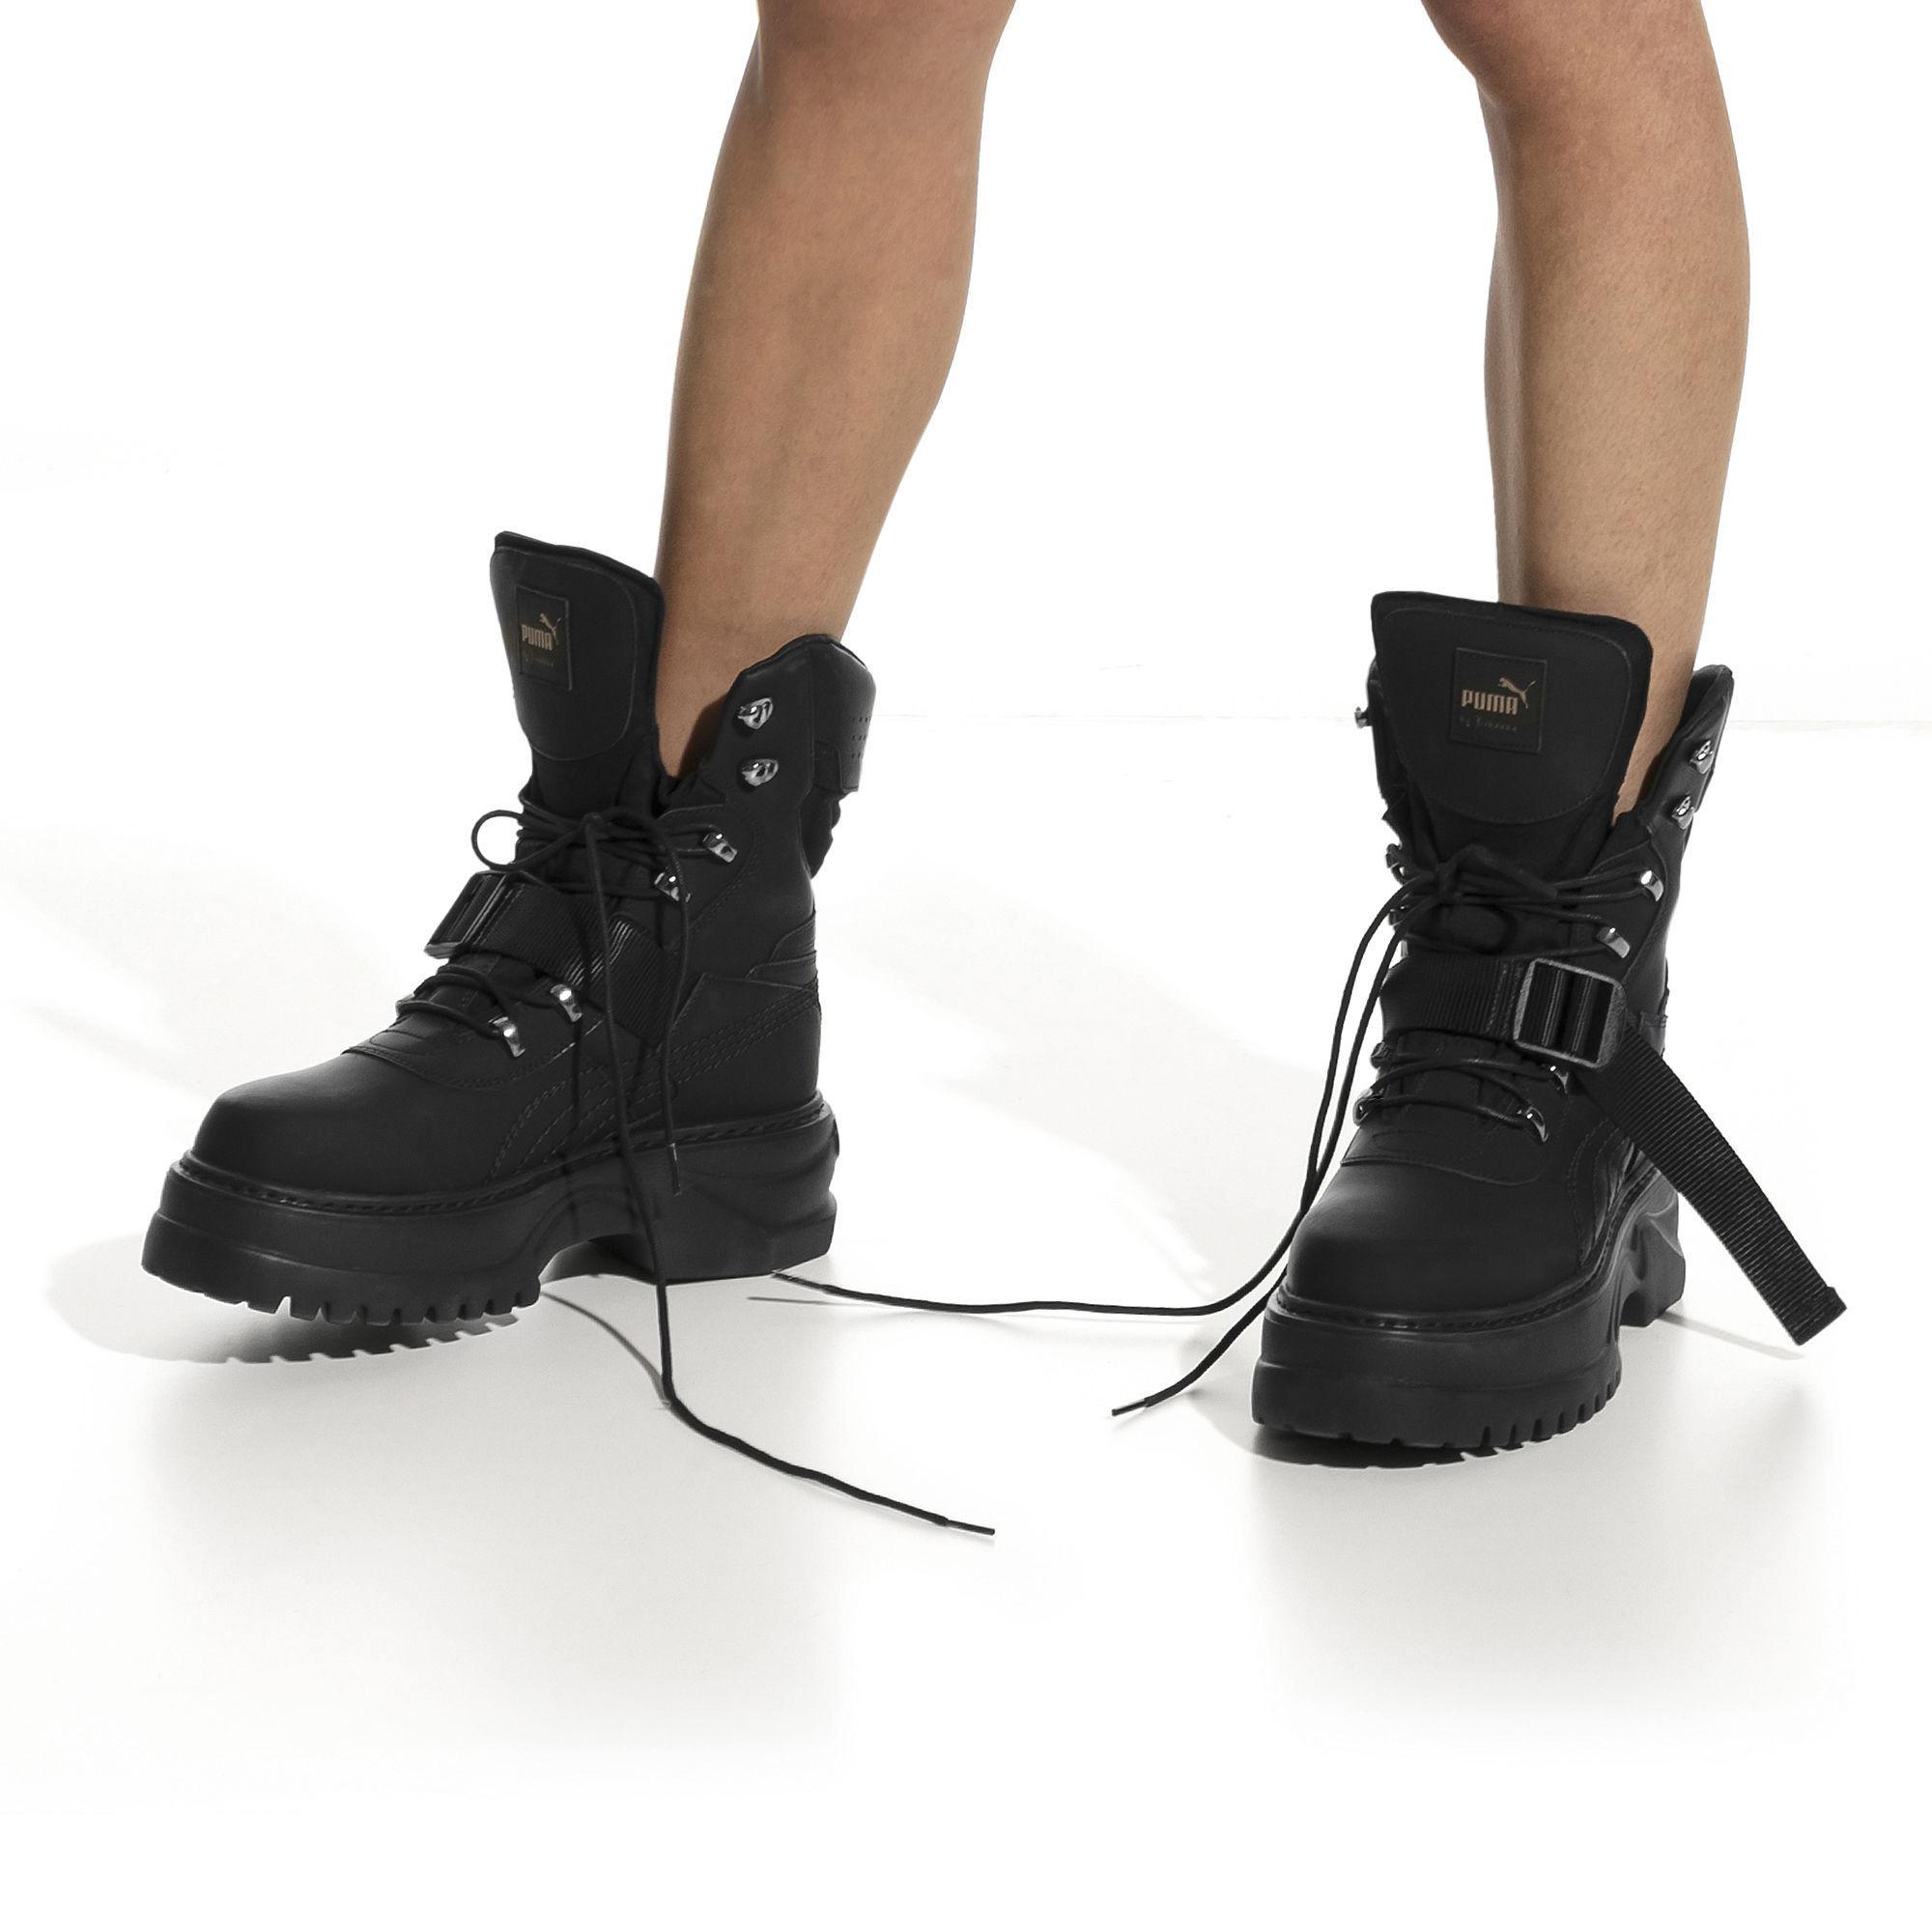 PUMA Fenty Women's Winter Boot Nubuck